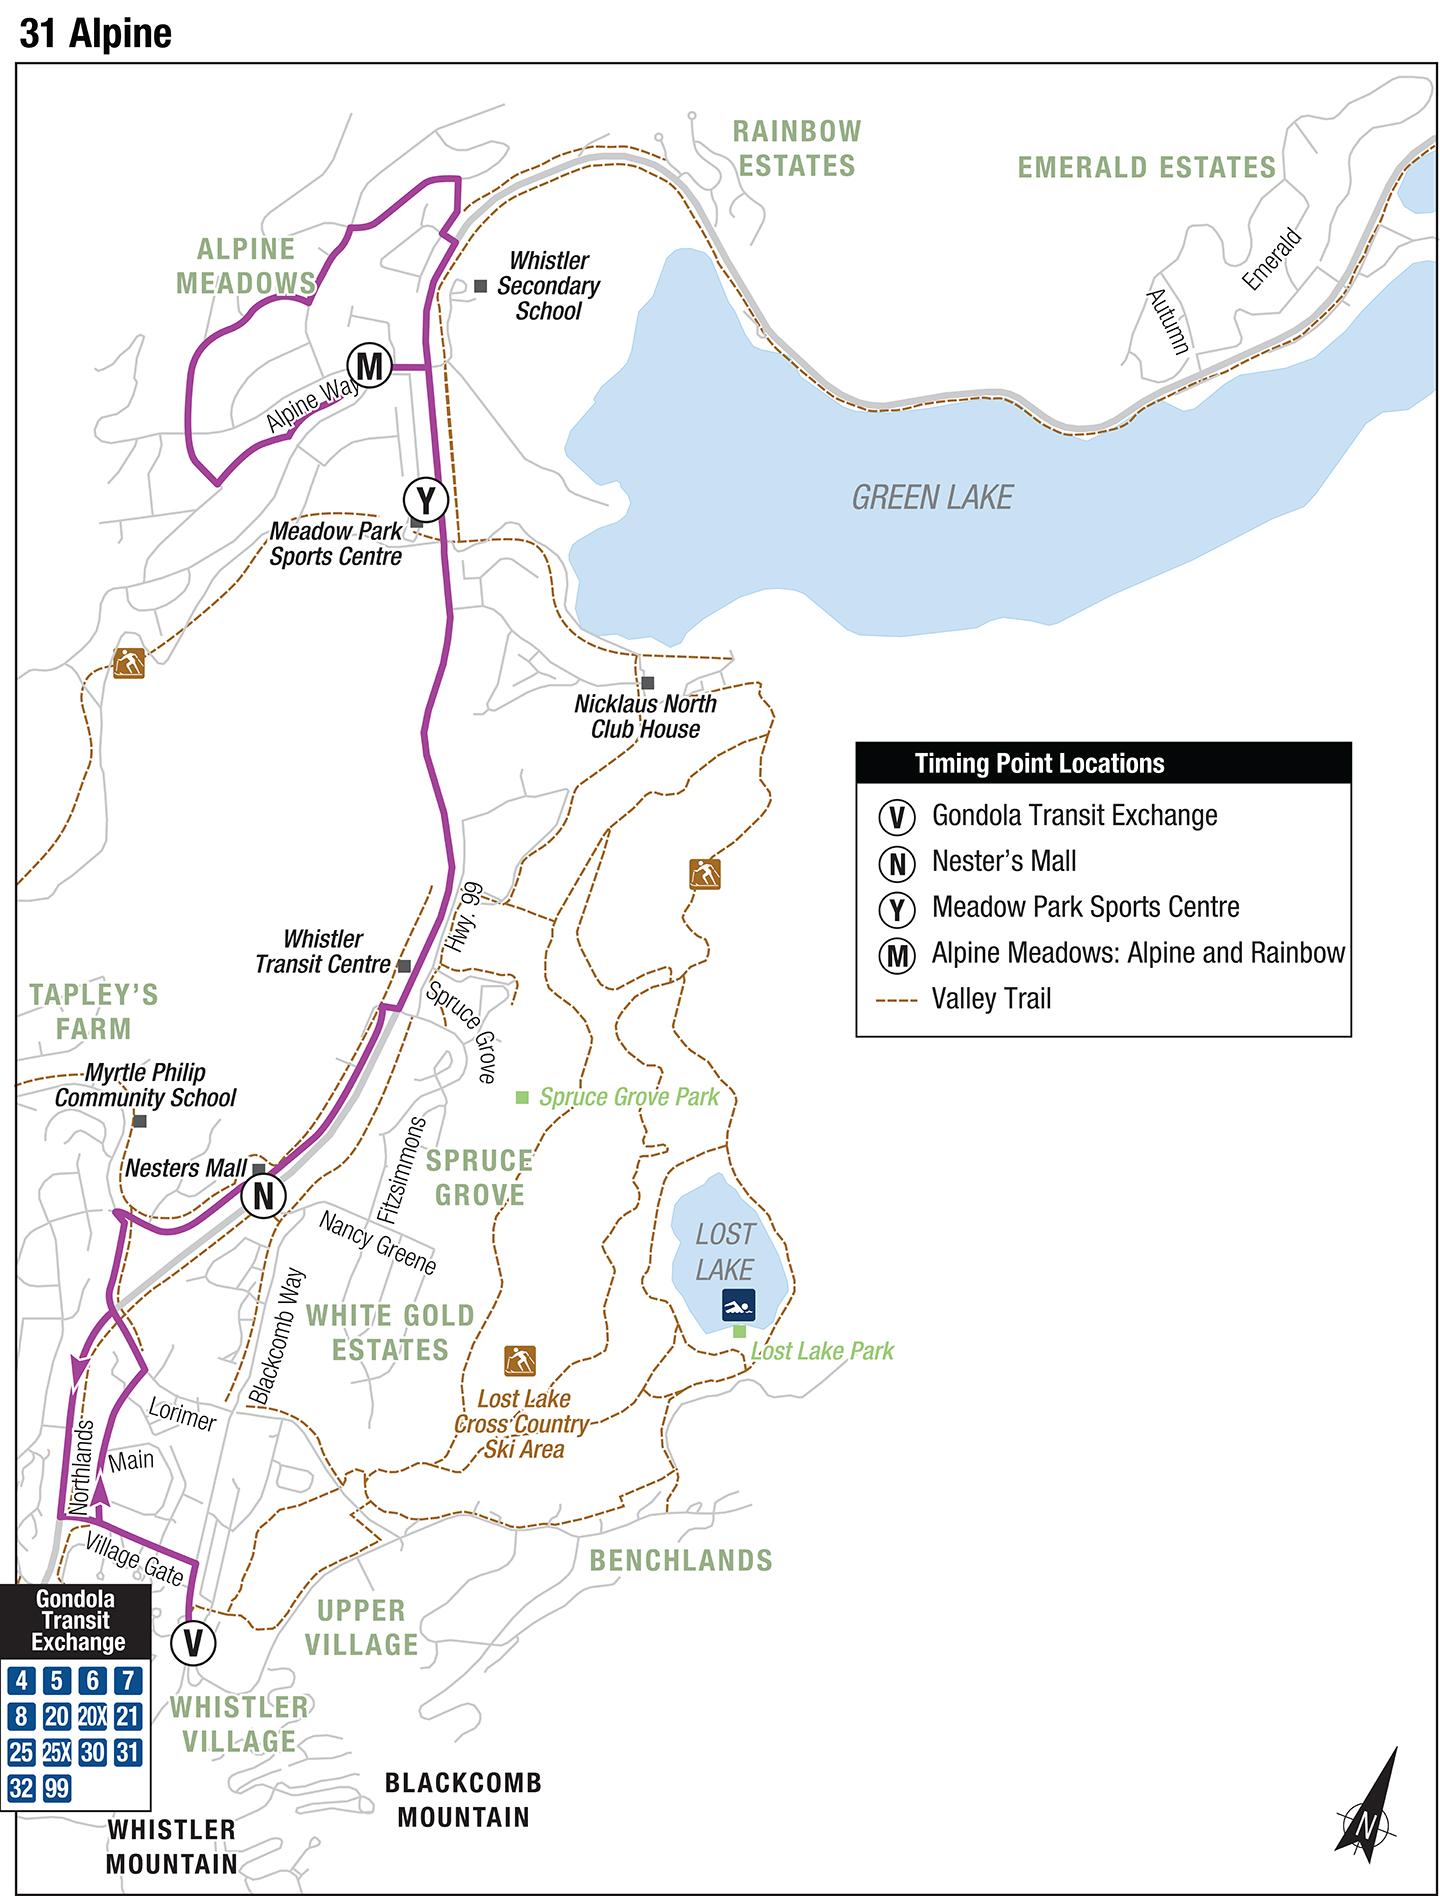 Route 31 Alpine